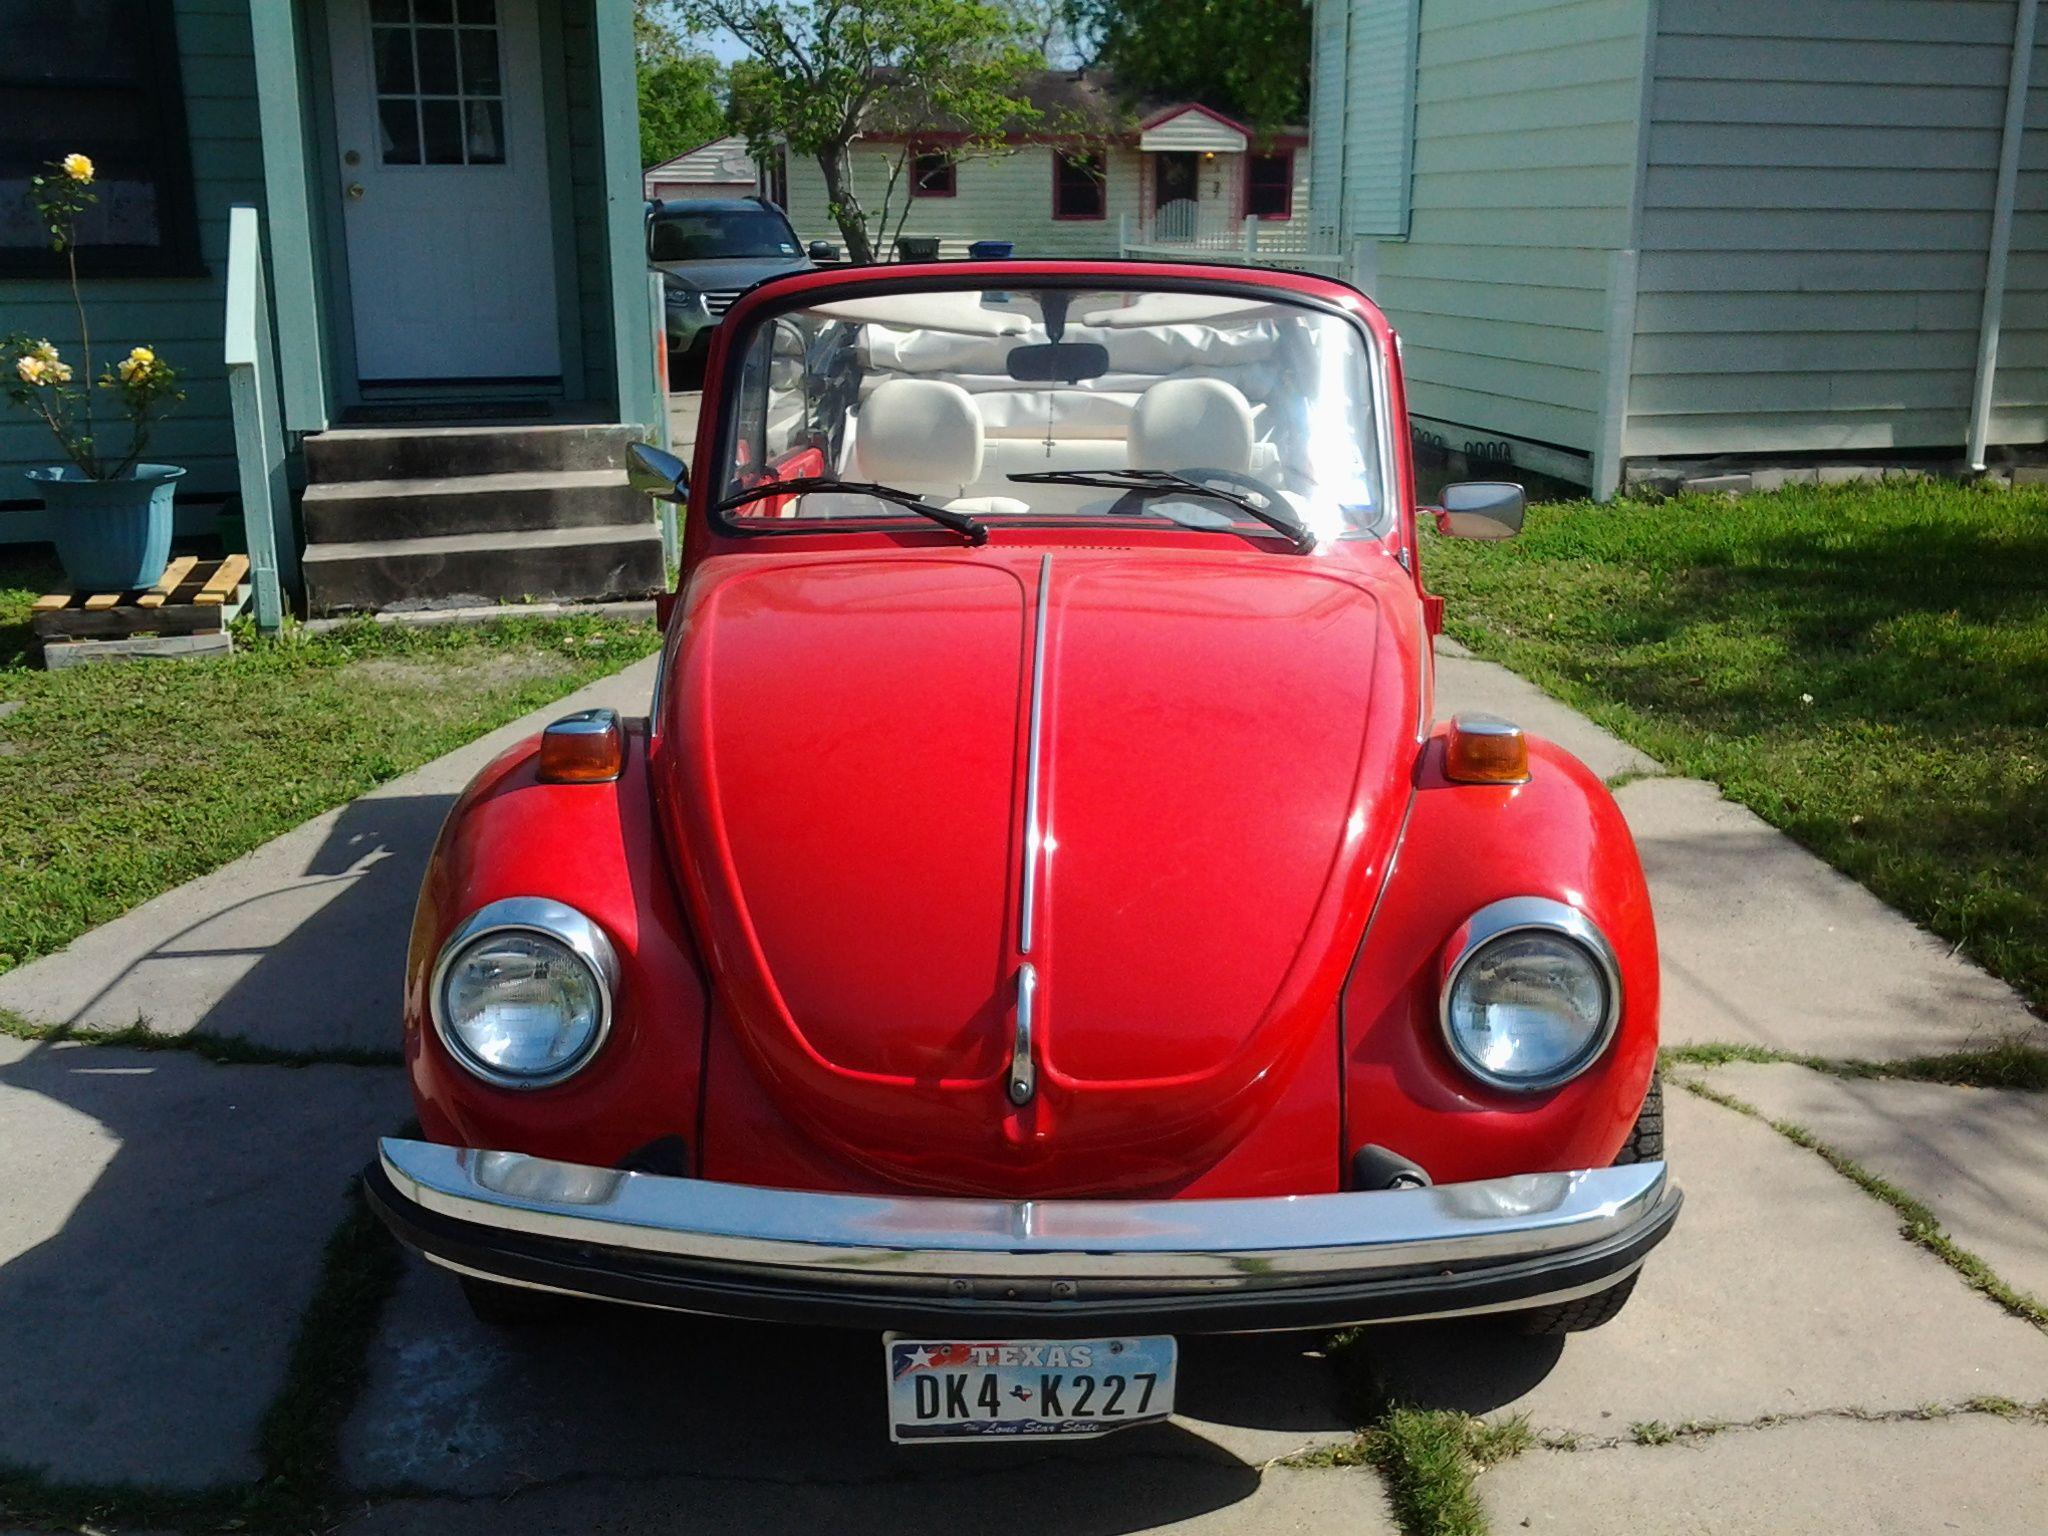 vw super beetle convertible - Google Search